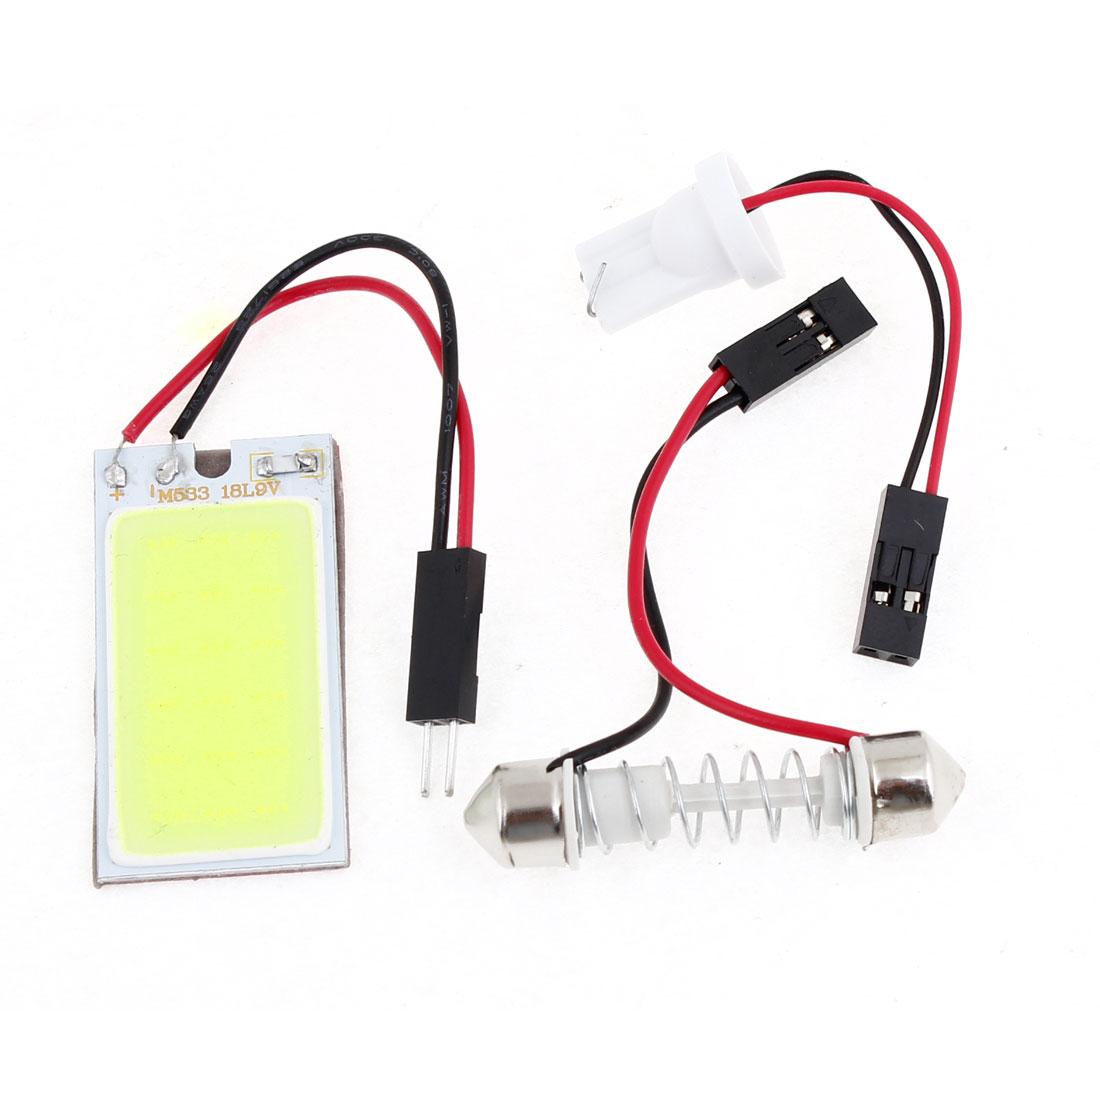 Auto Super Bright White 18 COB LED Light Bulb Panel + T10 Festoon Adapters